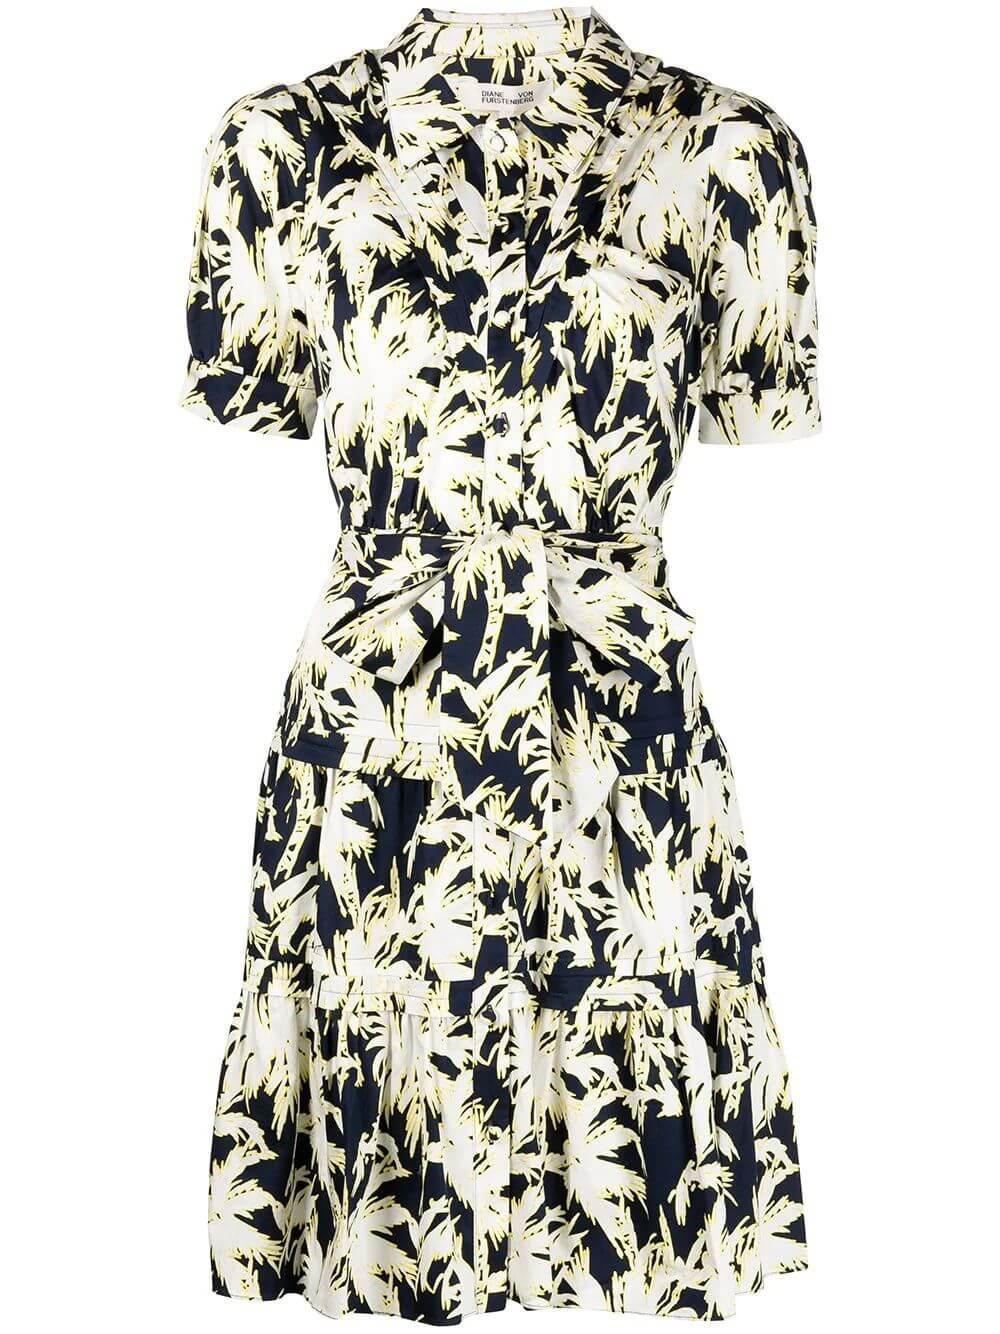 Amber Printed Shirt Dress Item # DVFDS2P005